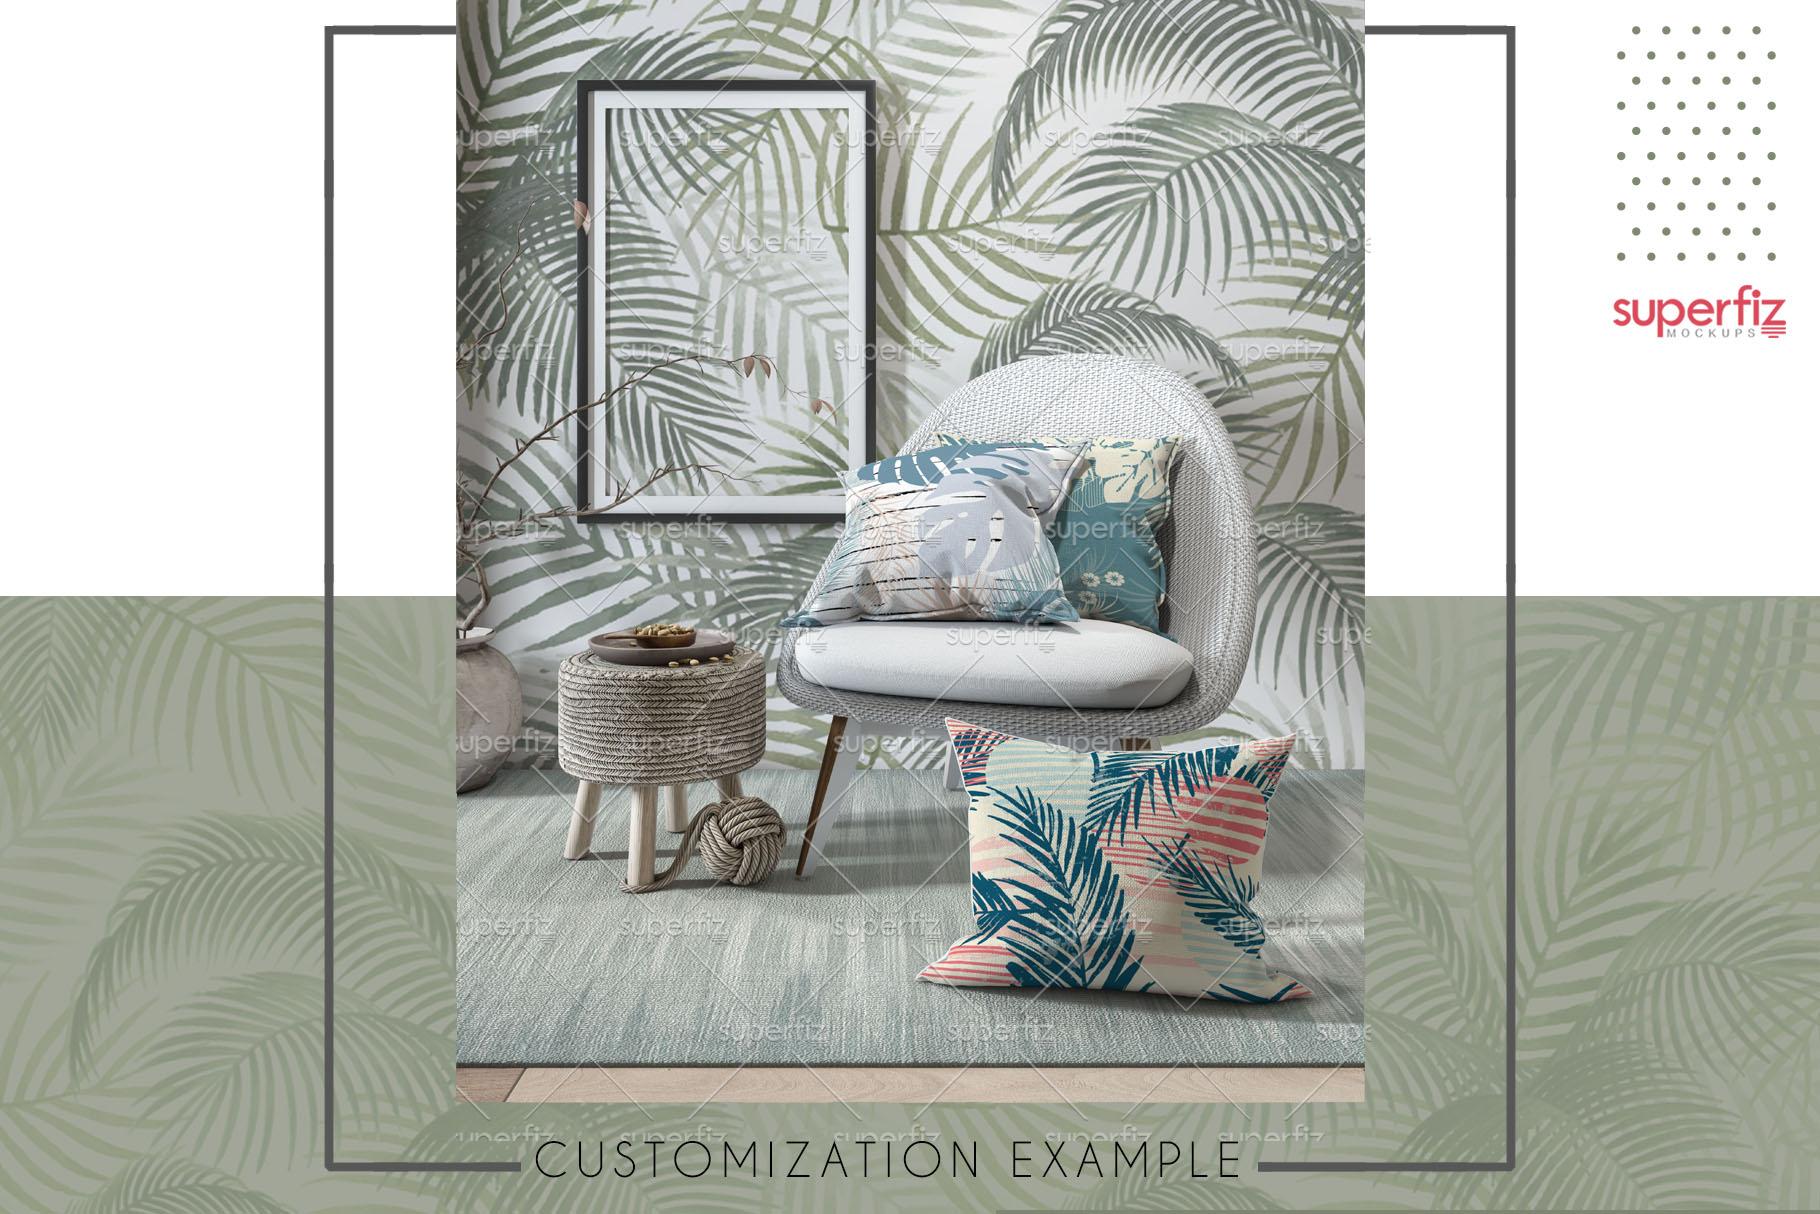 Pillows Wallpaper Frame Carpet PSD Mockup SM77 example image 3